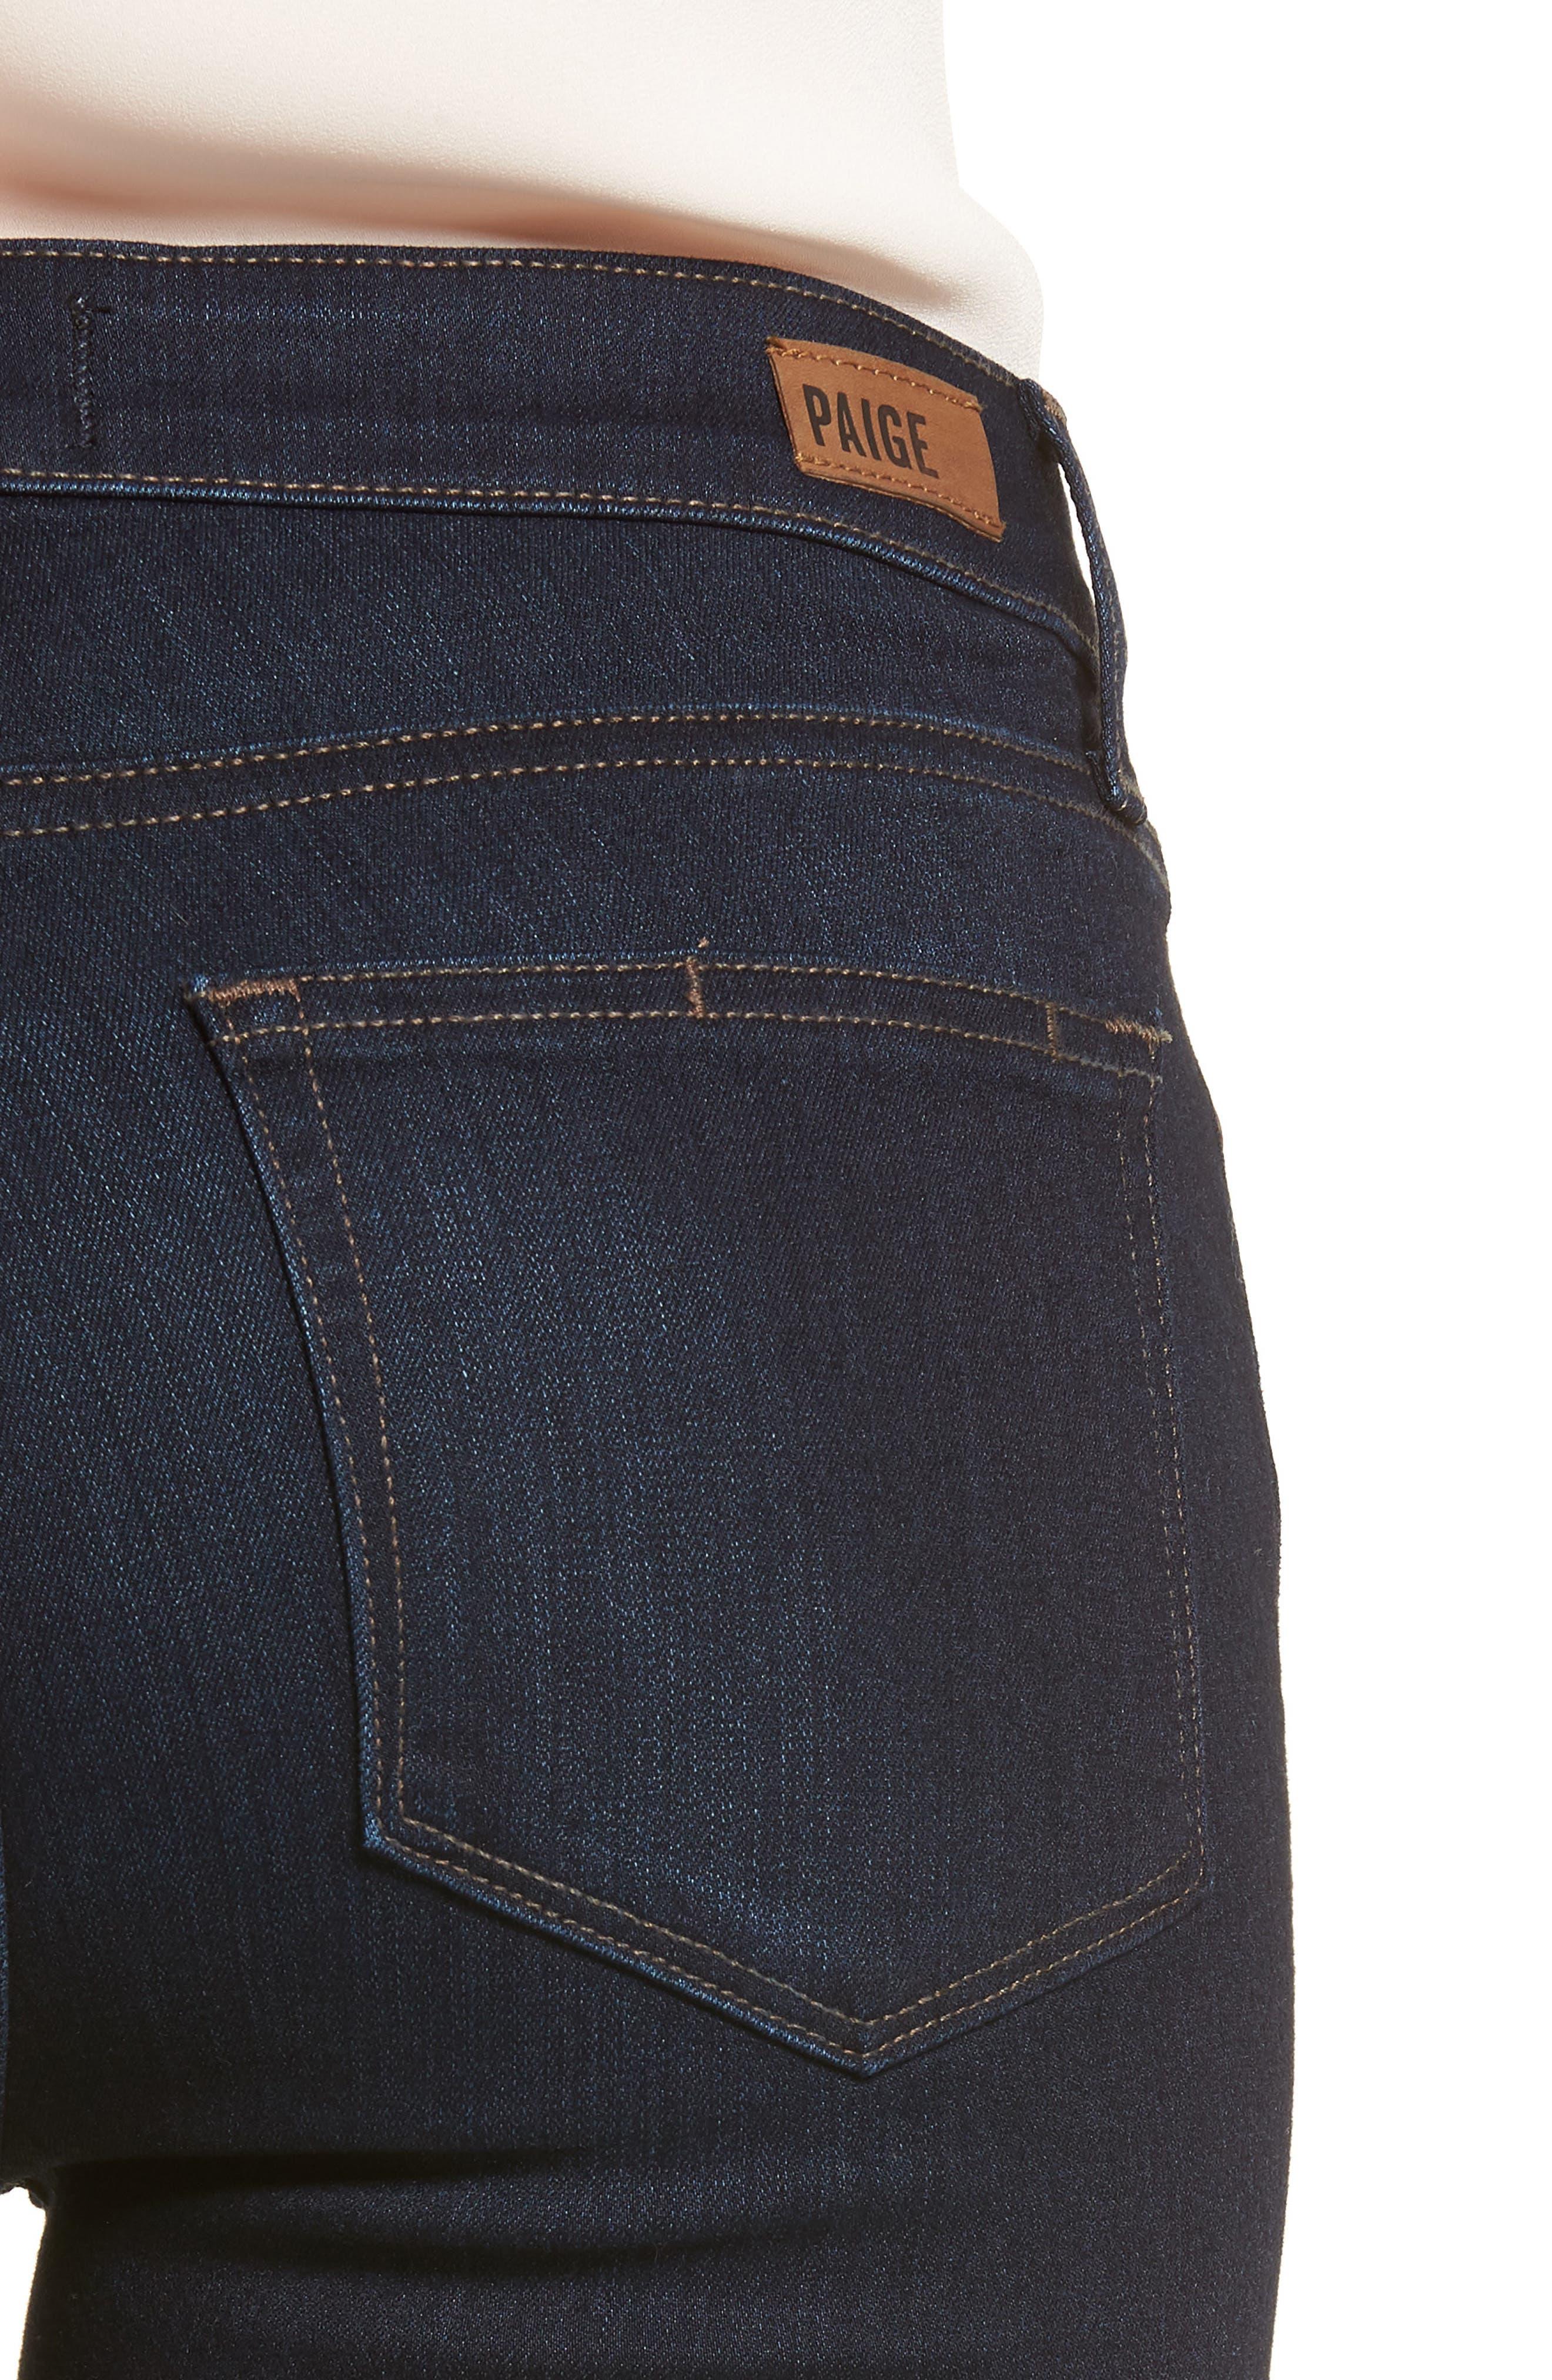 Transcend - Verdugo Ankle Skinny Jeans,                             Alternate thumbnail 4, color,                             RENNA